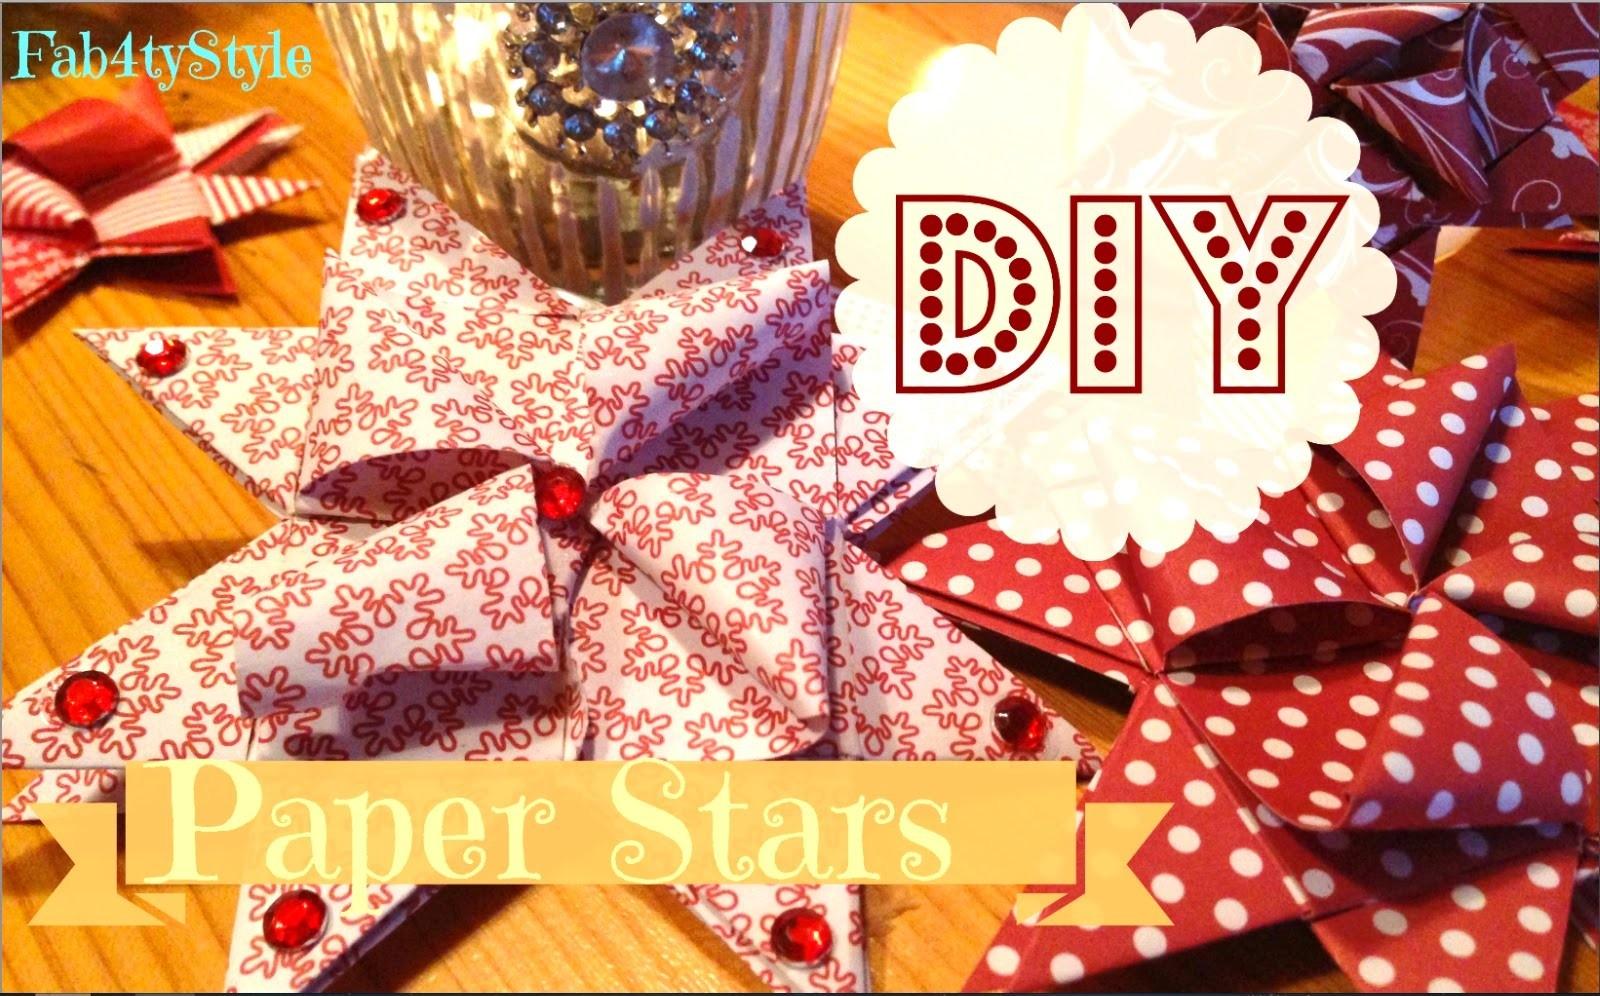 ☆ DIY Papiersterne ☆ Fröbel Sterne ☆ DIY Paper Stars ♥ Fab4tyStyle